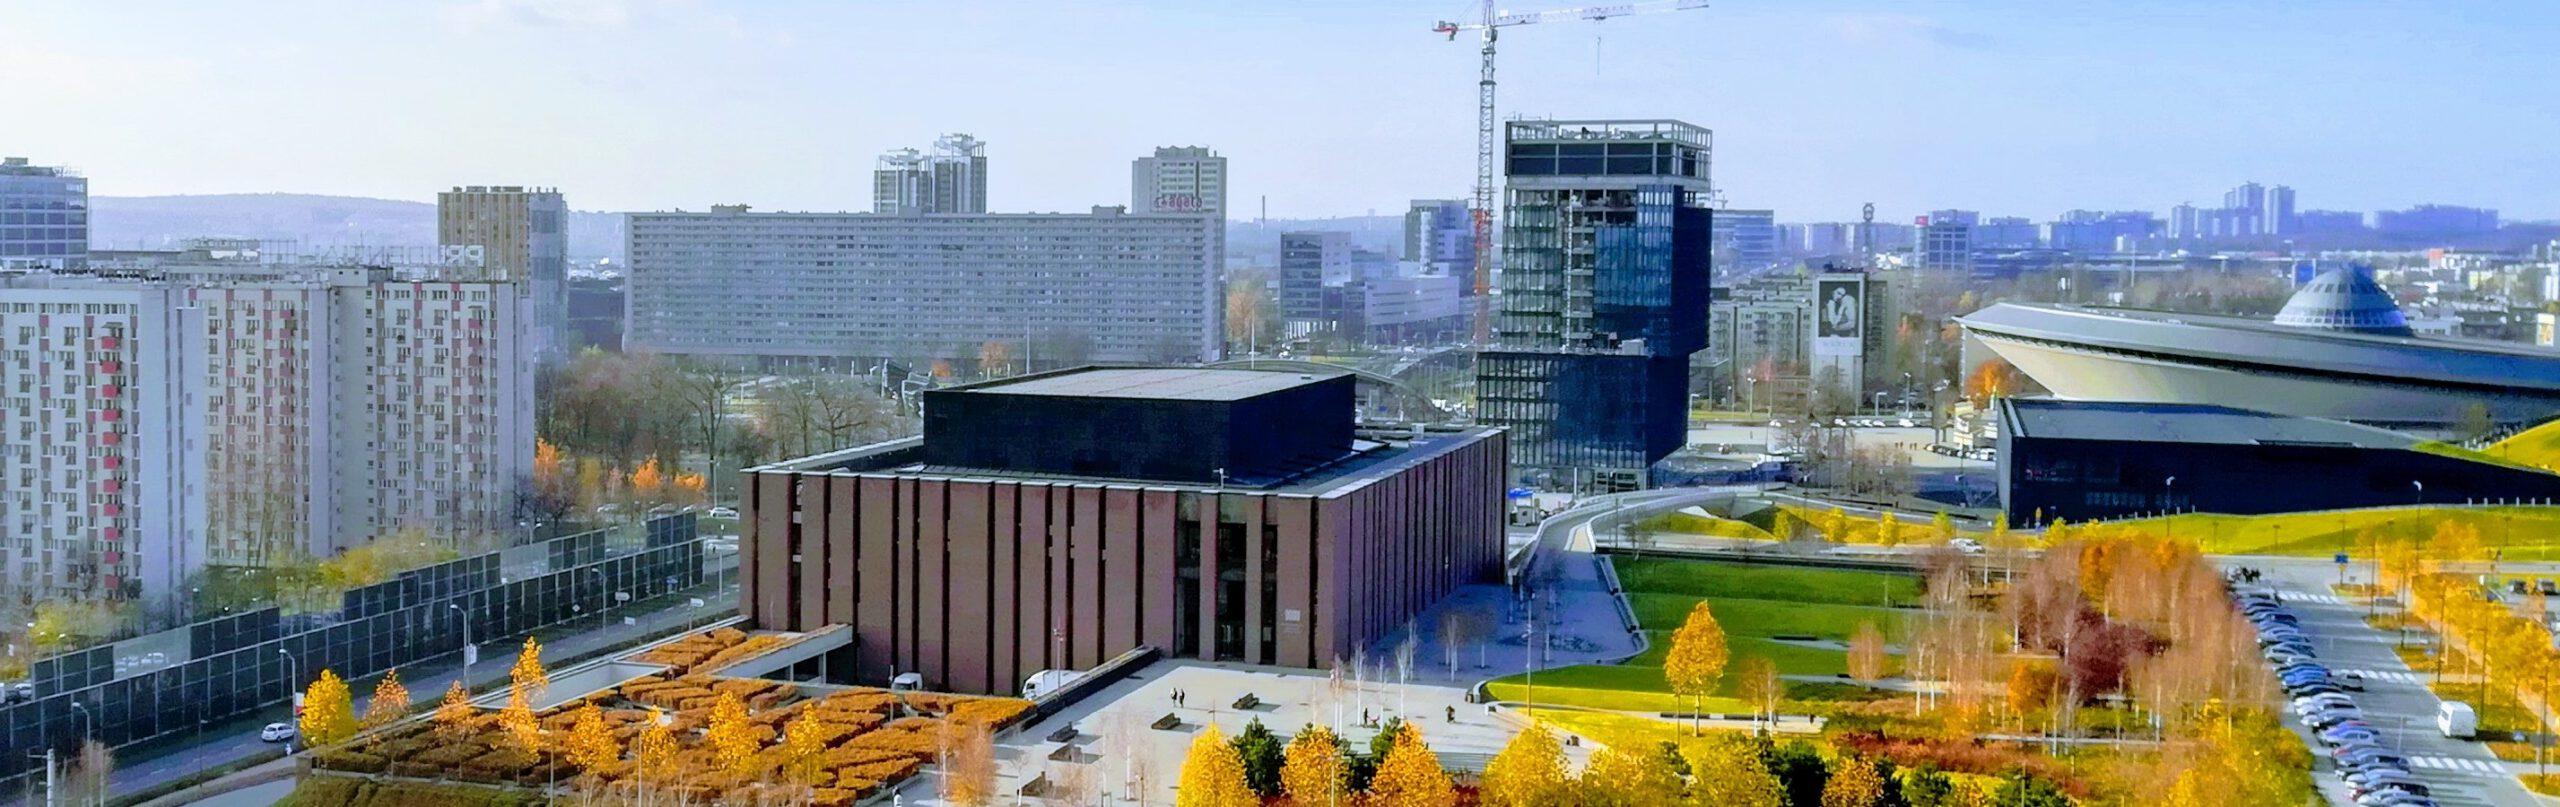 Katowice angielski